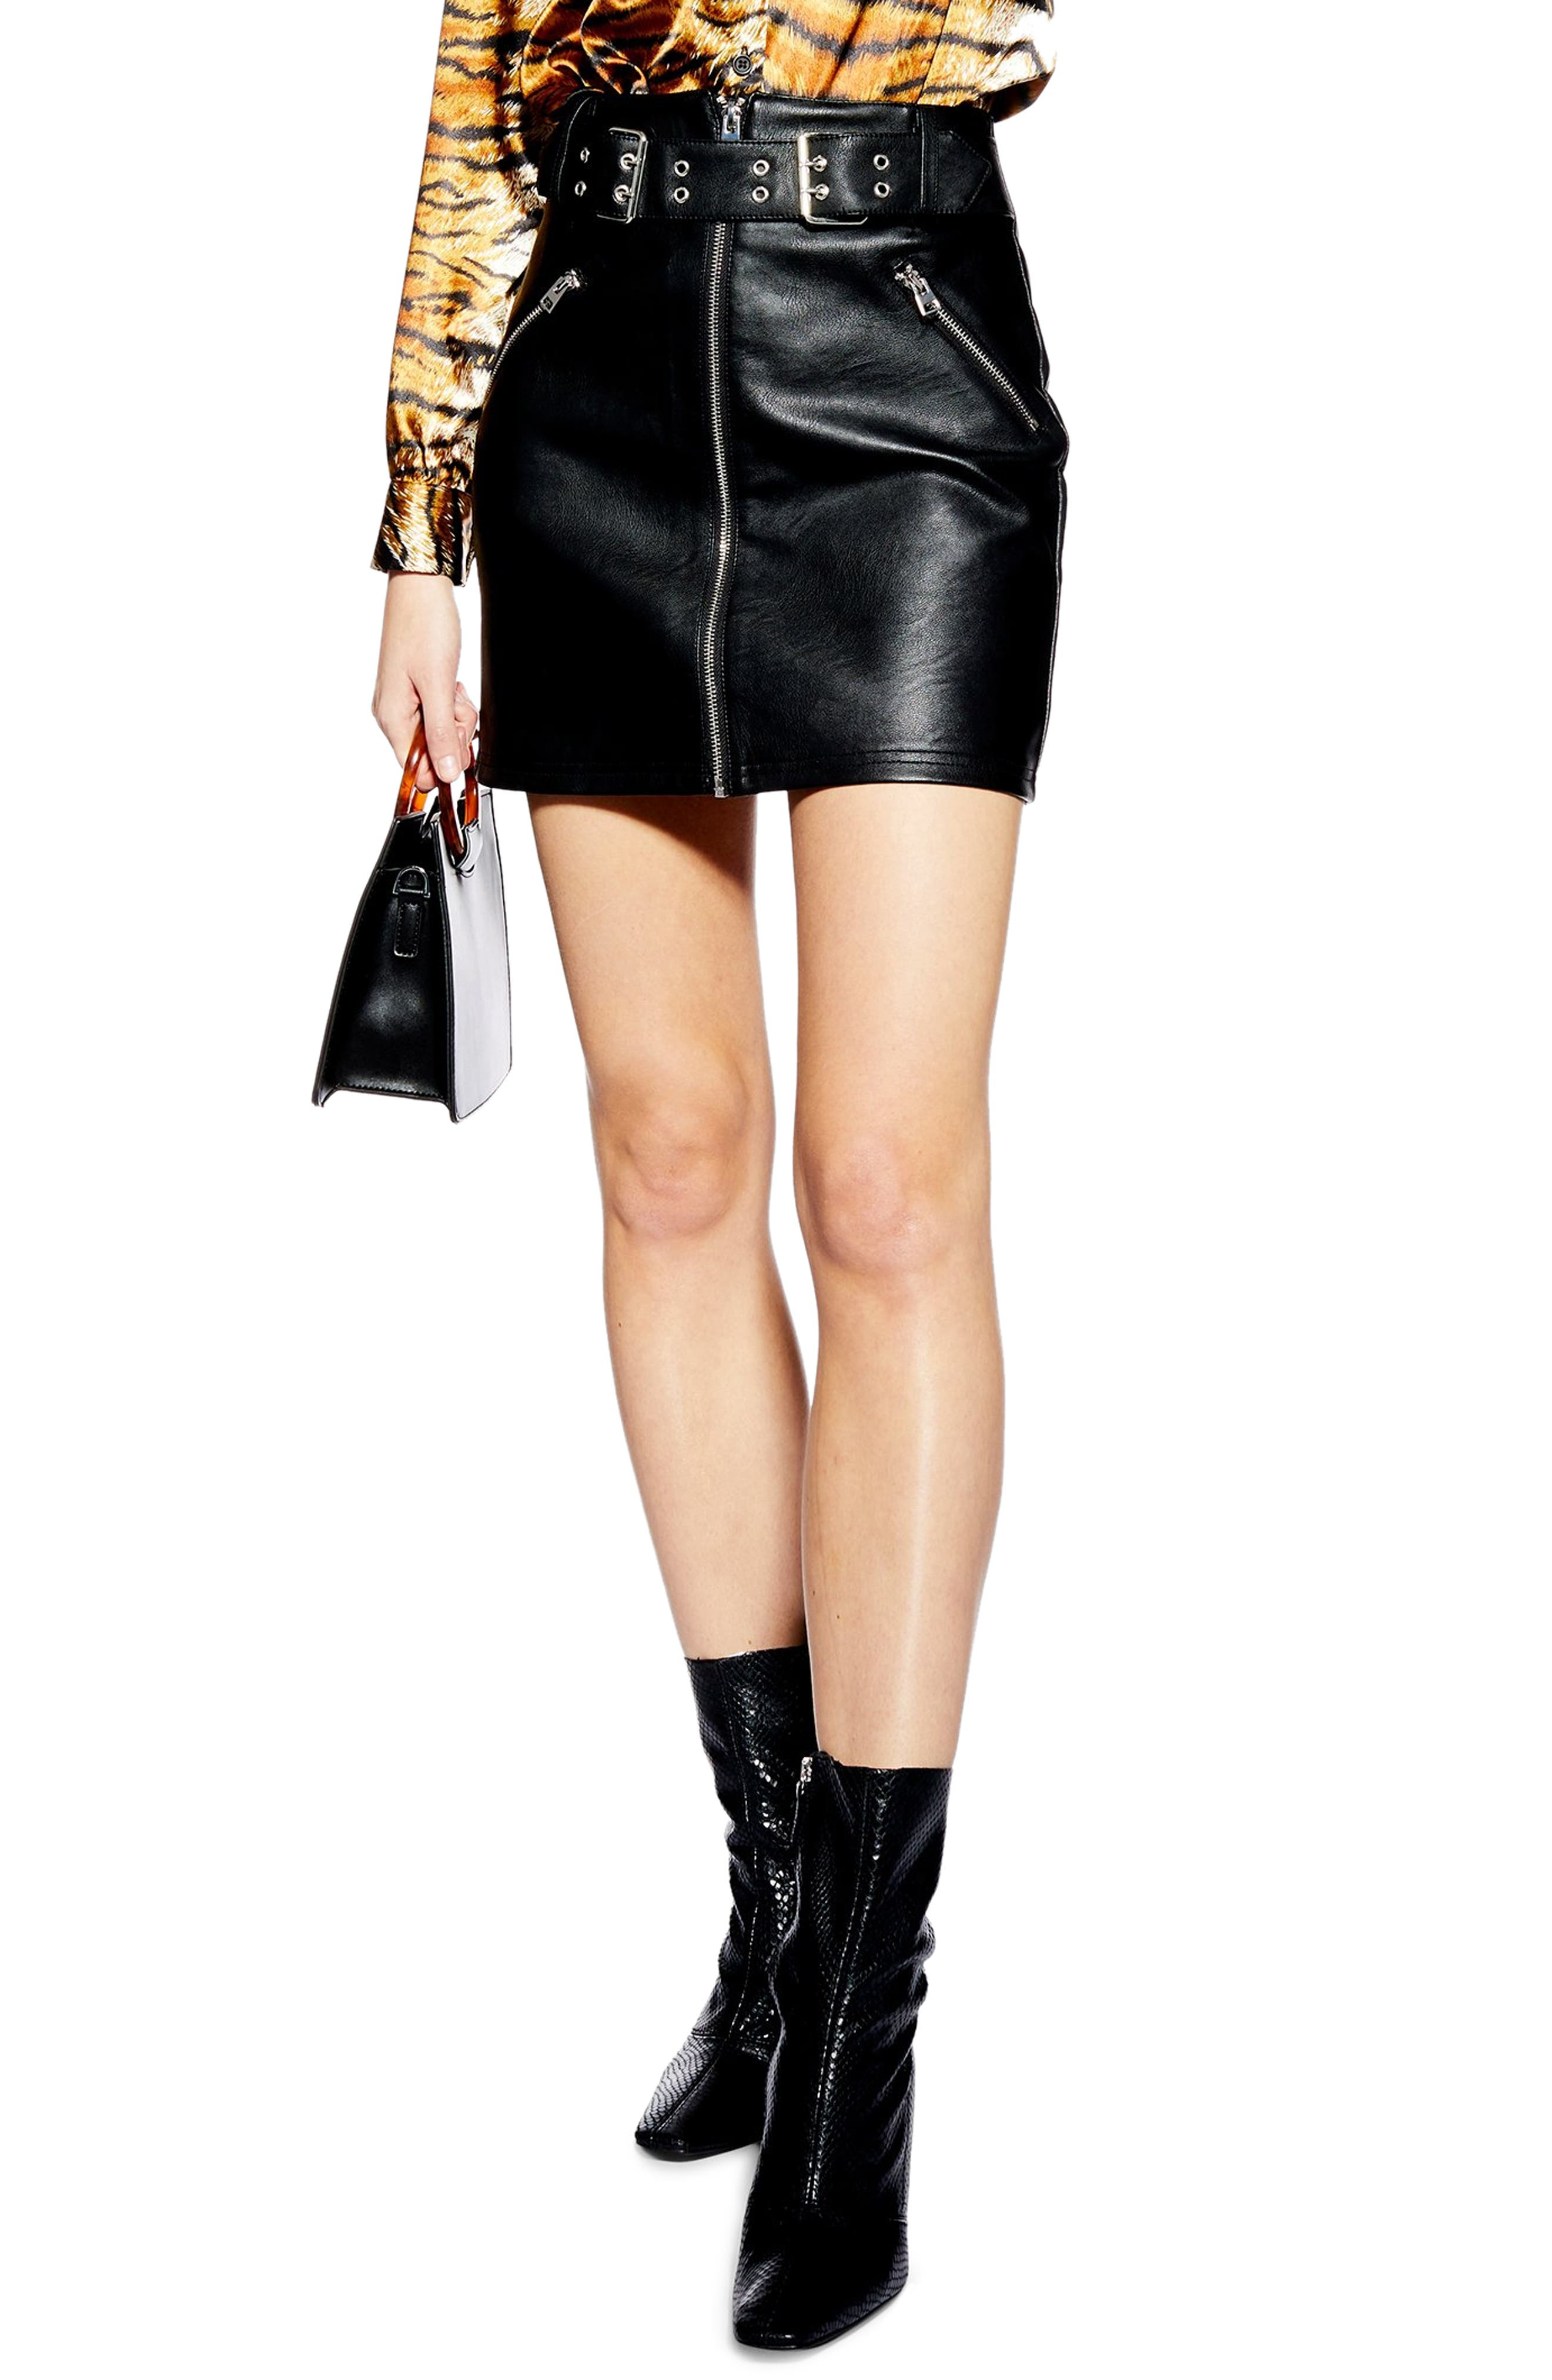 Petite Topshop Beatrix Faux Leather Miniskirt, P US (fits like 0P) - Black